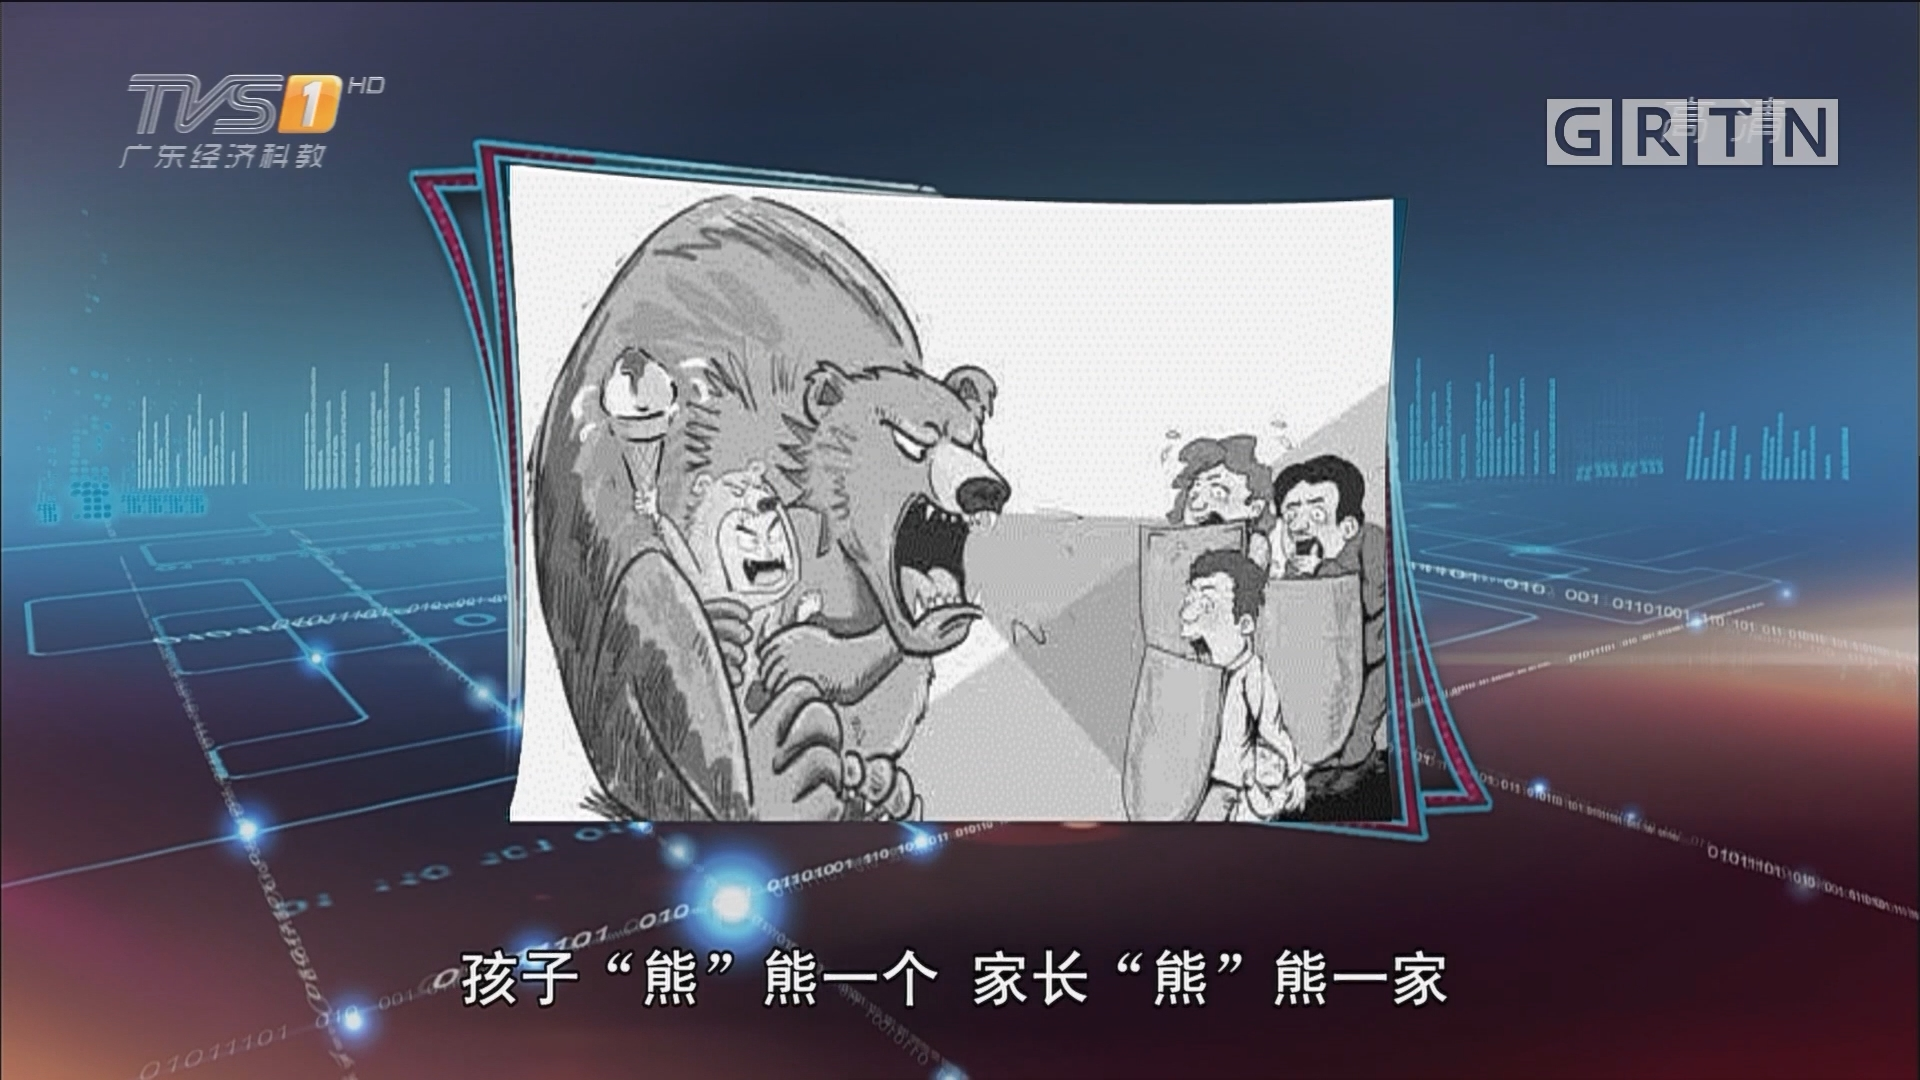 [HD][2017-06-27]马后炮:熊孩子问题的根源是熊家长